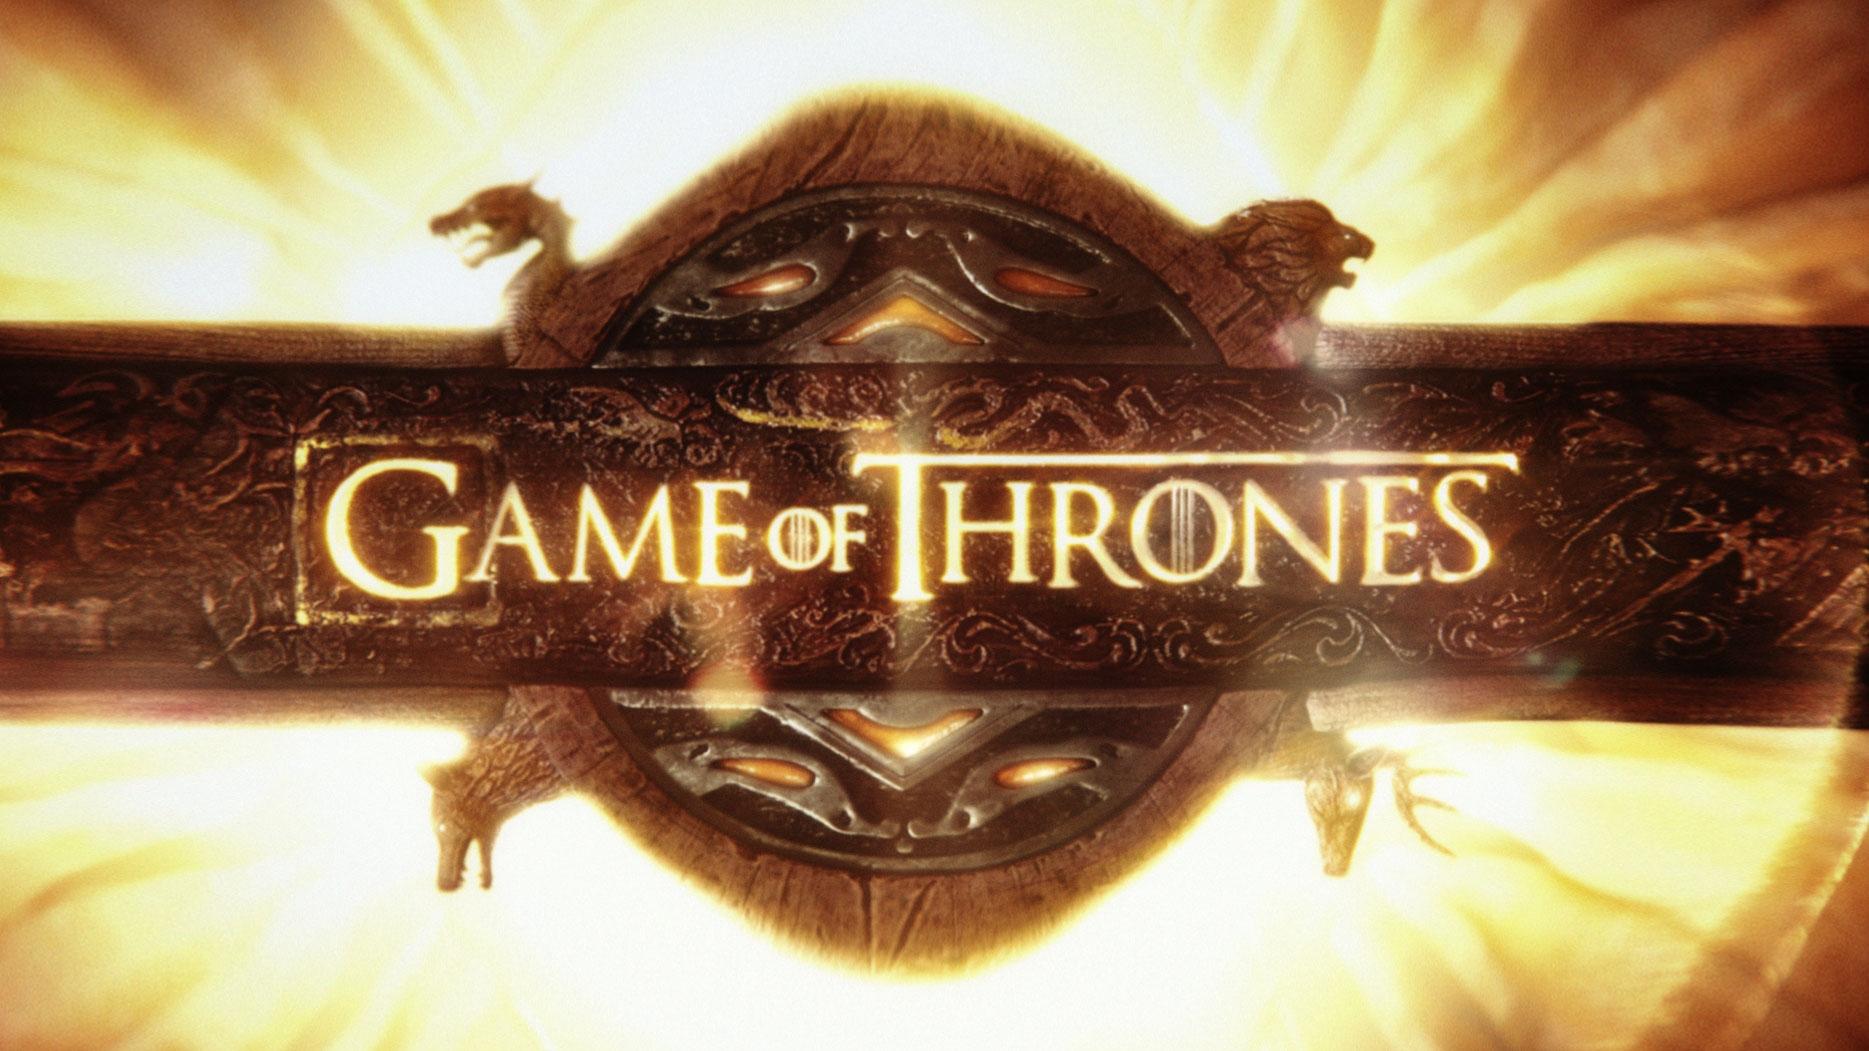 2012-07-14-game_of_thrones-e1385083961895